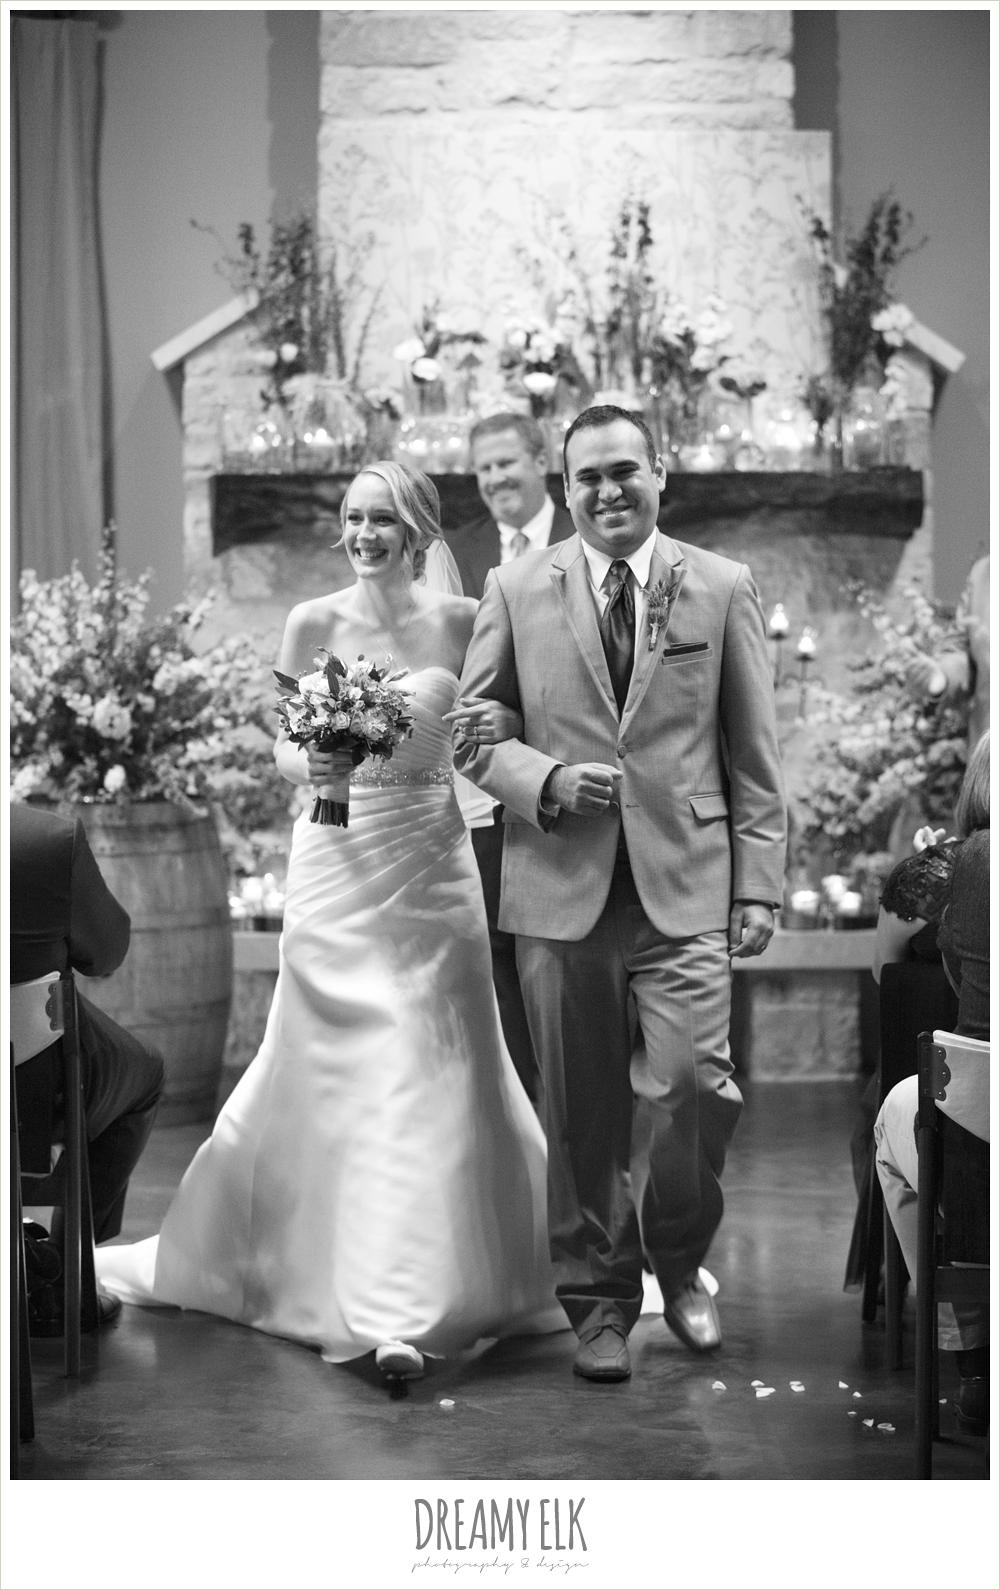 black and white, indoor wedding ceremony, winter vineyard wedding, dreamy elk photography and design